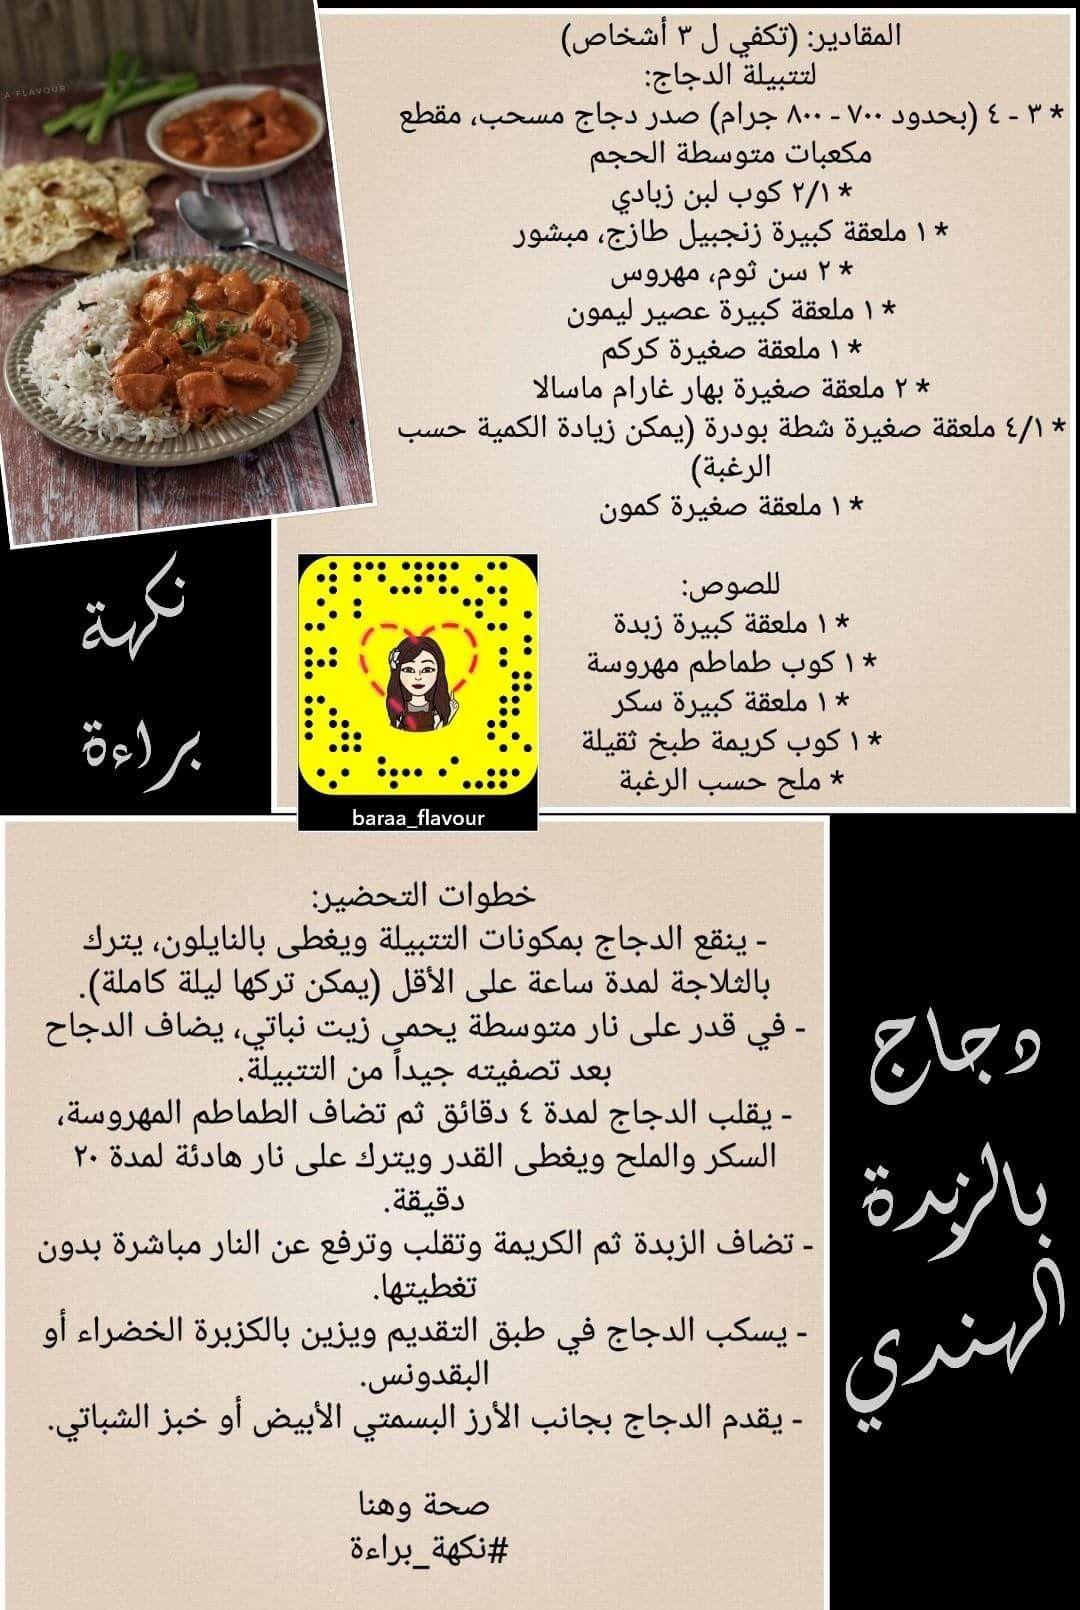 دجاج بالزبدة Food Receipes Food Food And Drink